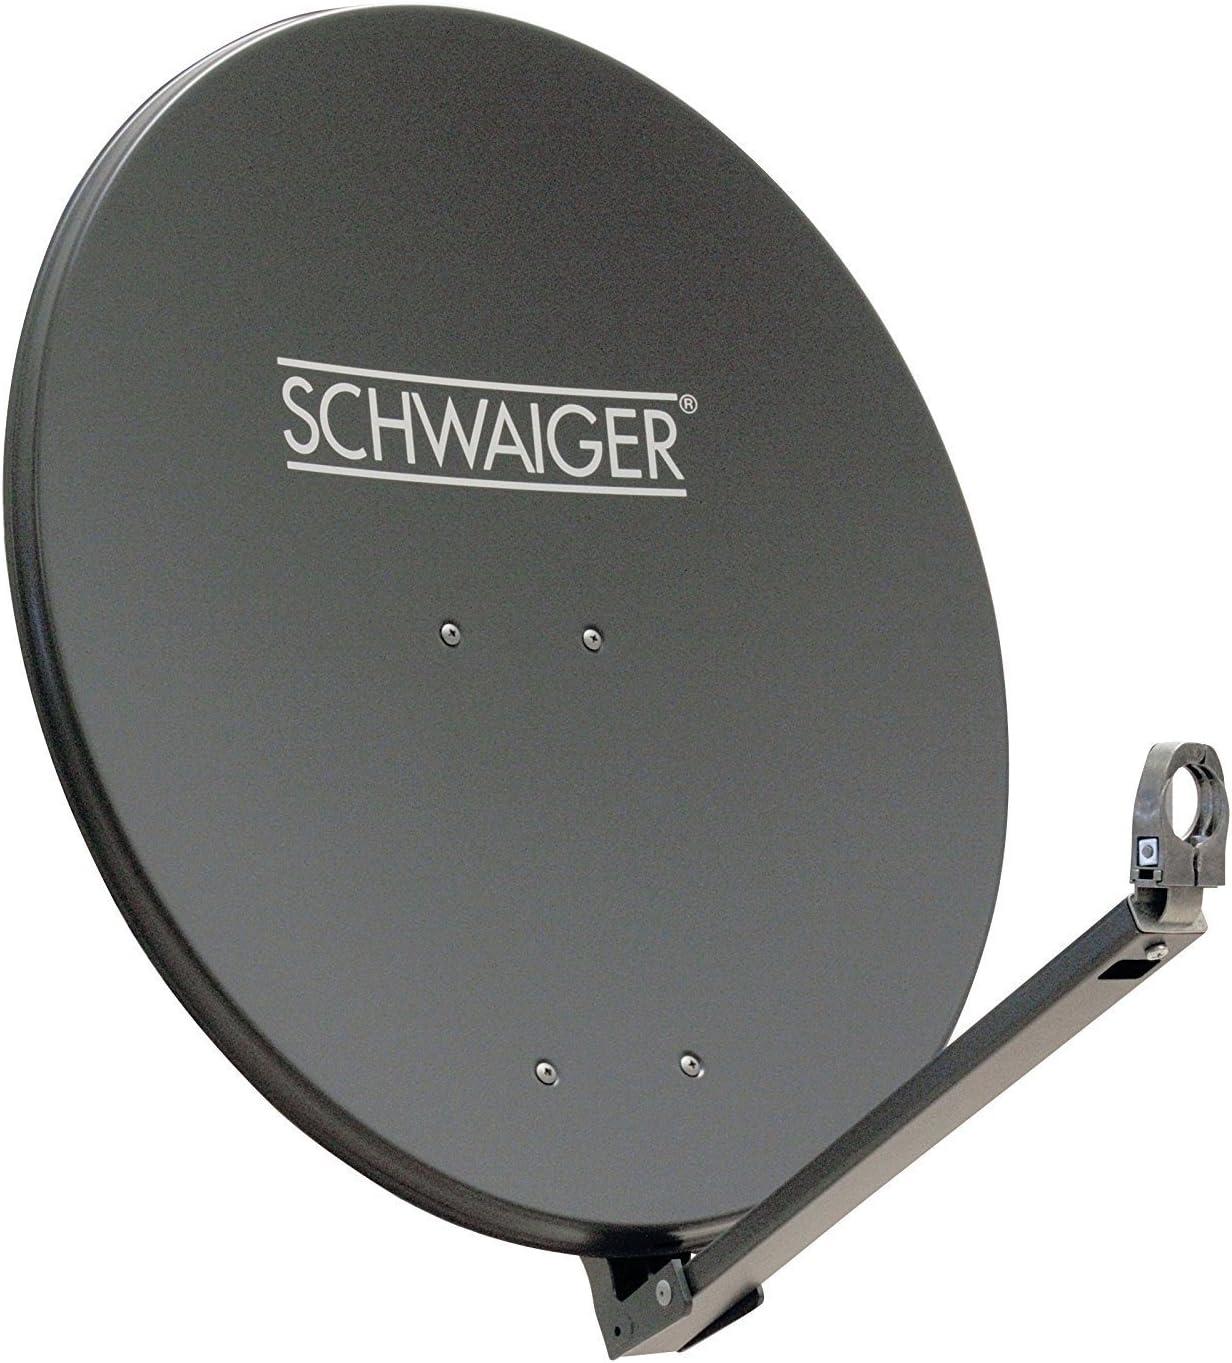 SCHWAIGER -227- Antena satelital | antena satelital con brazo de soporte LNB y montaje en mástil | antena satelital de aluminio | antracita | 74,5 x ...